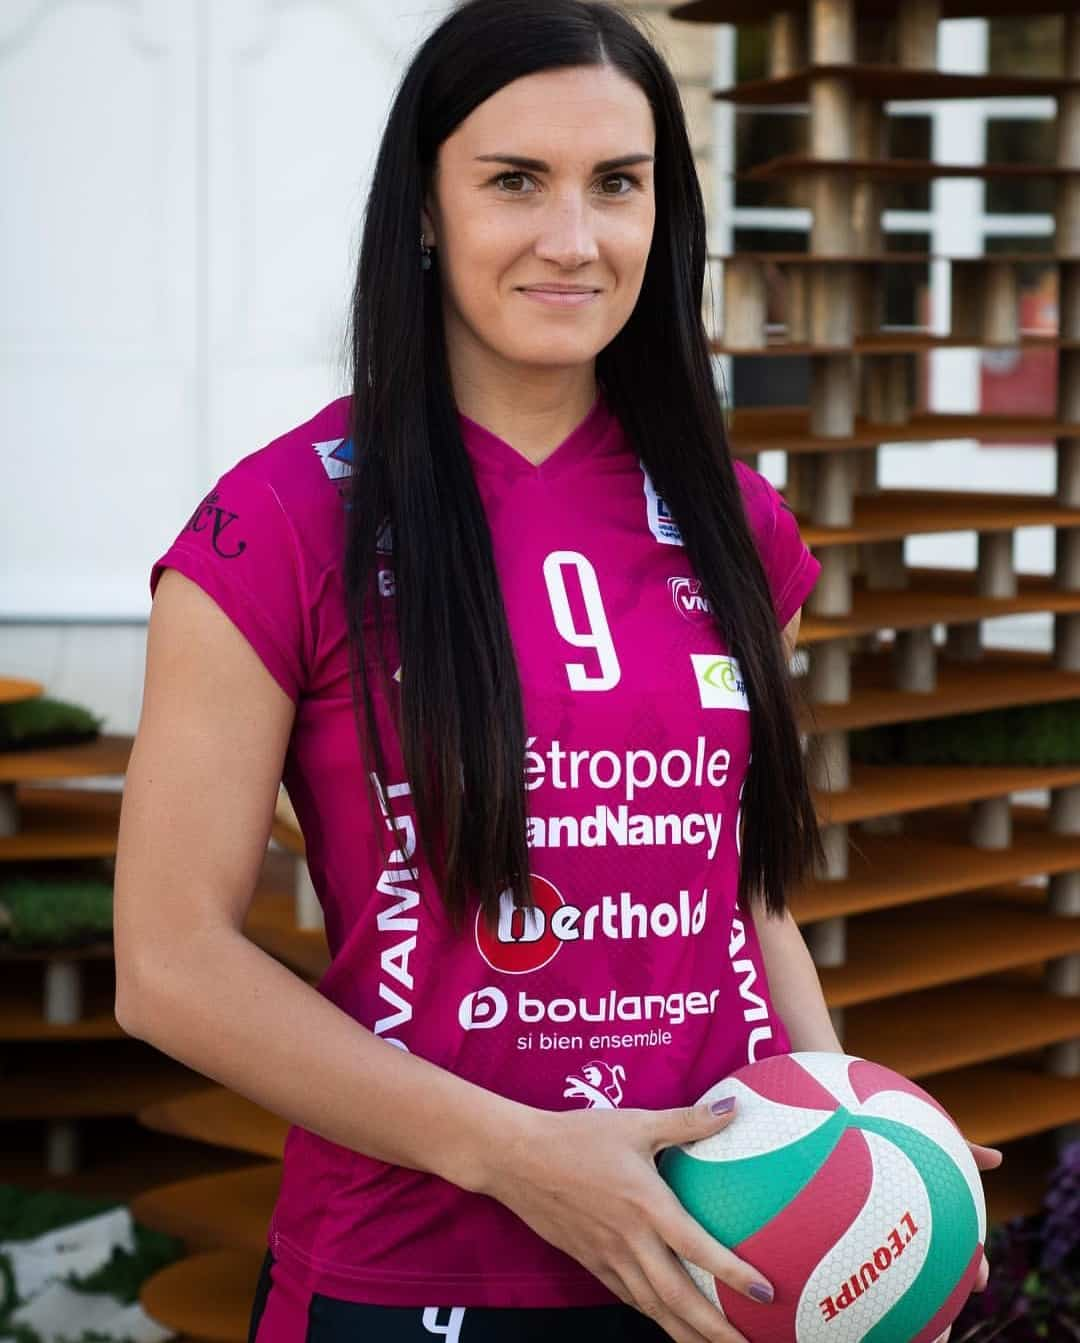 nouveau-maillot-volley-vandoeuvre-nancy-volley-ball-errea-2018-2019-laf-lnv-1